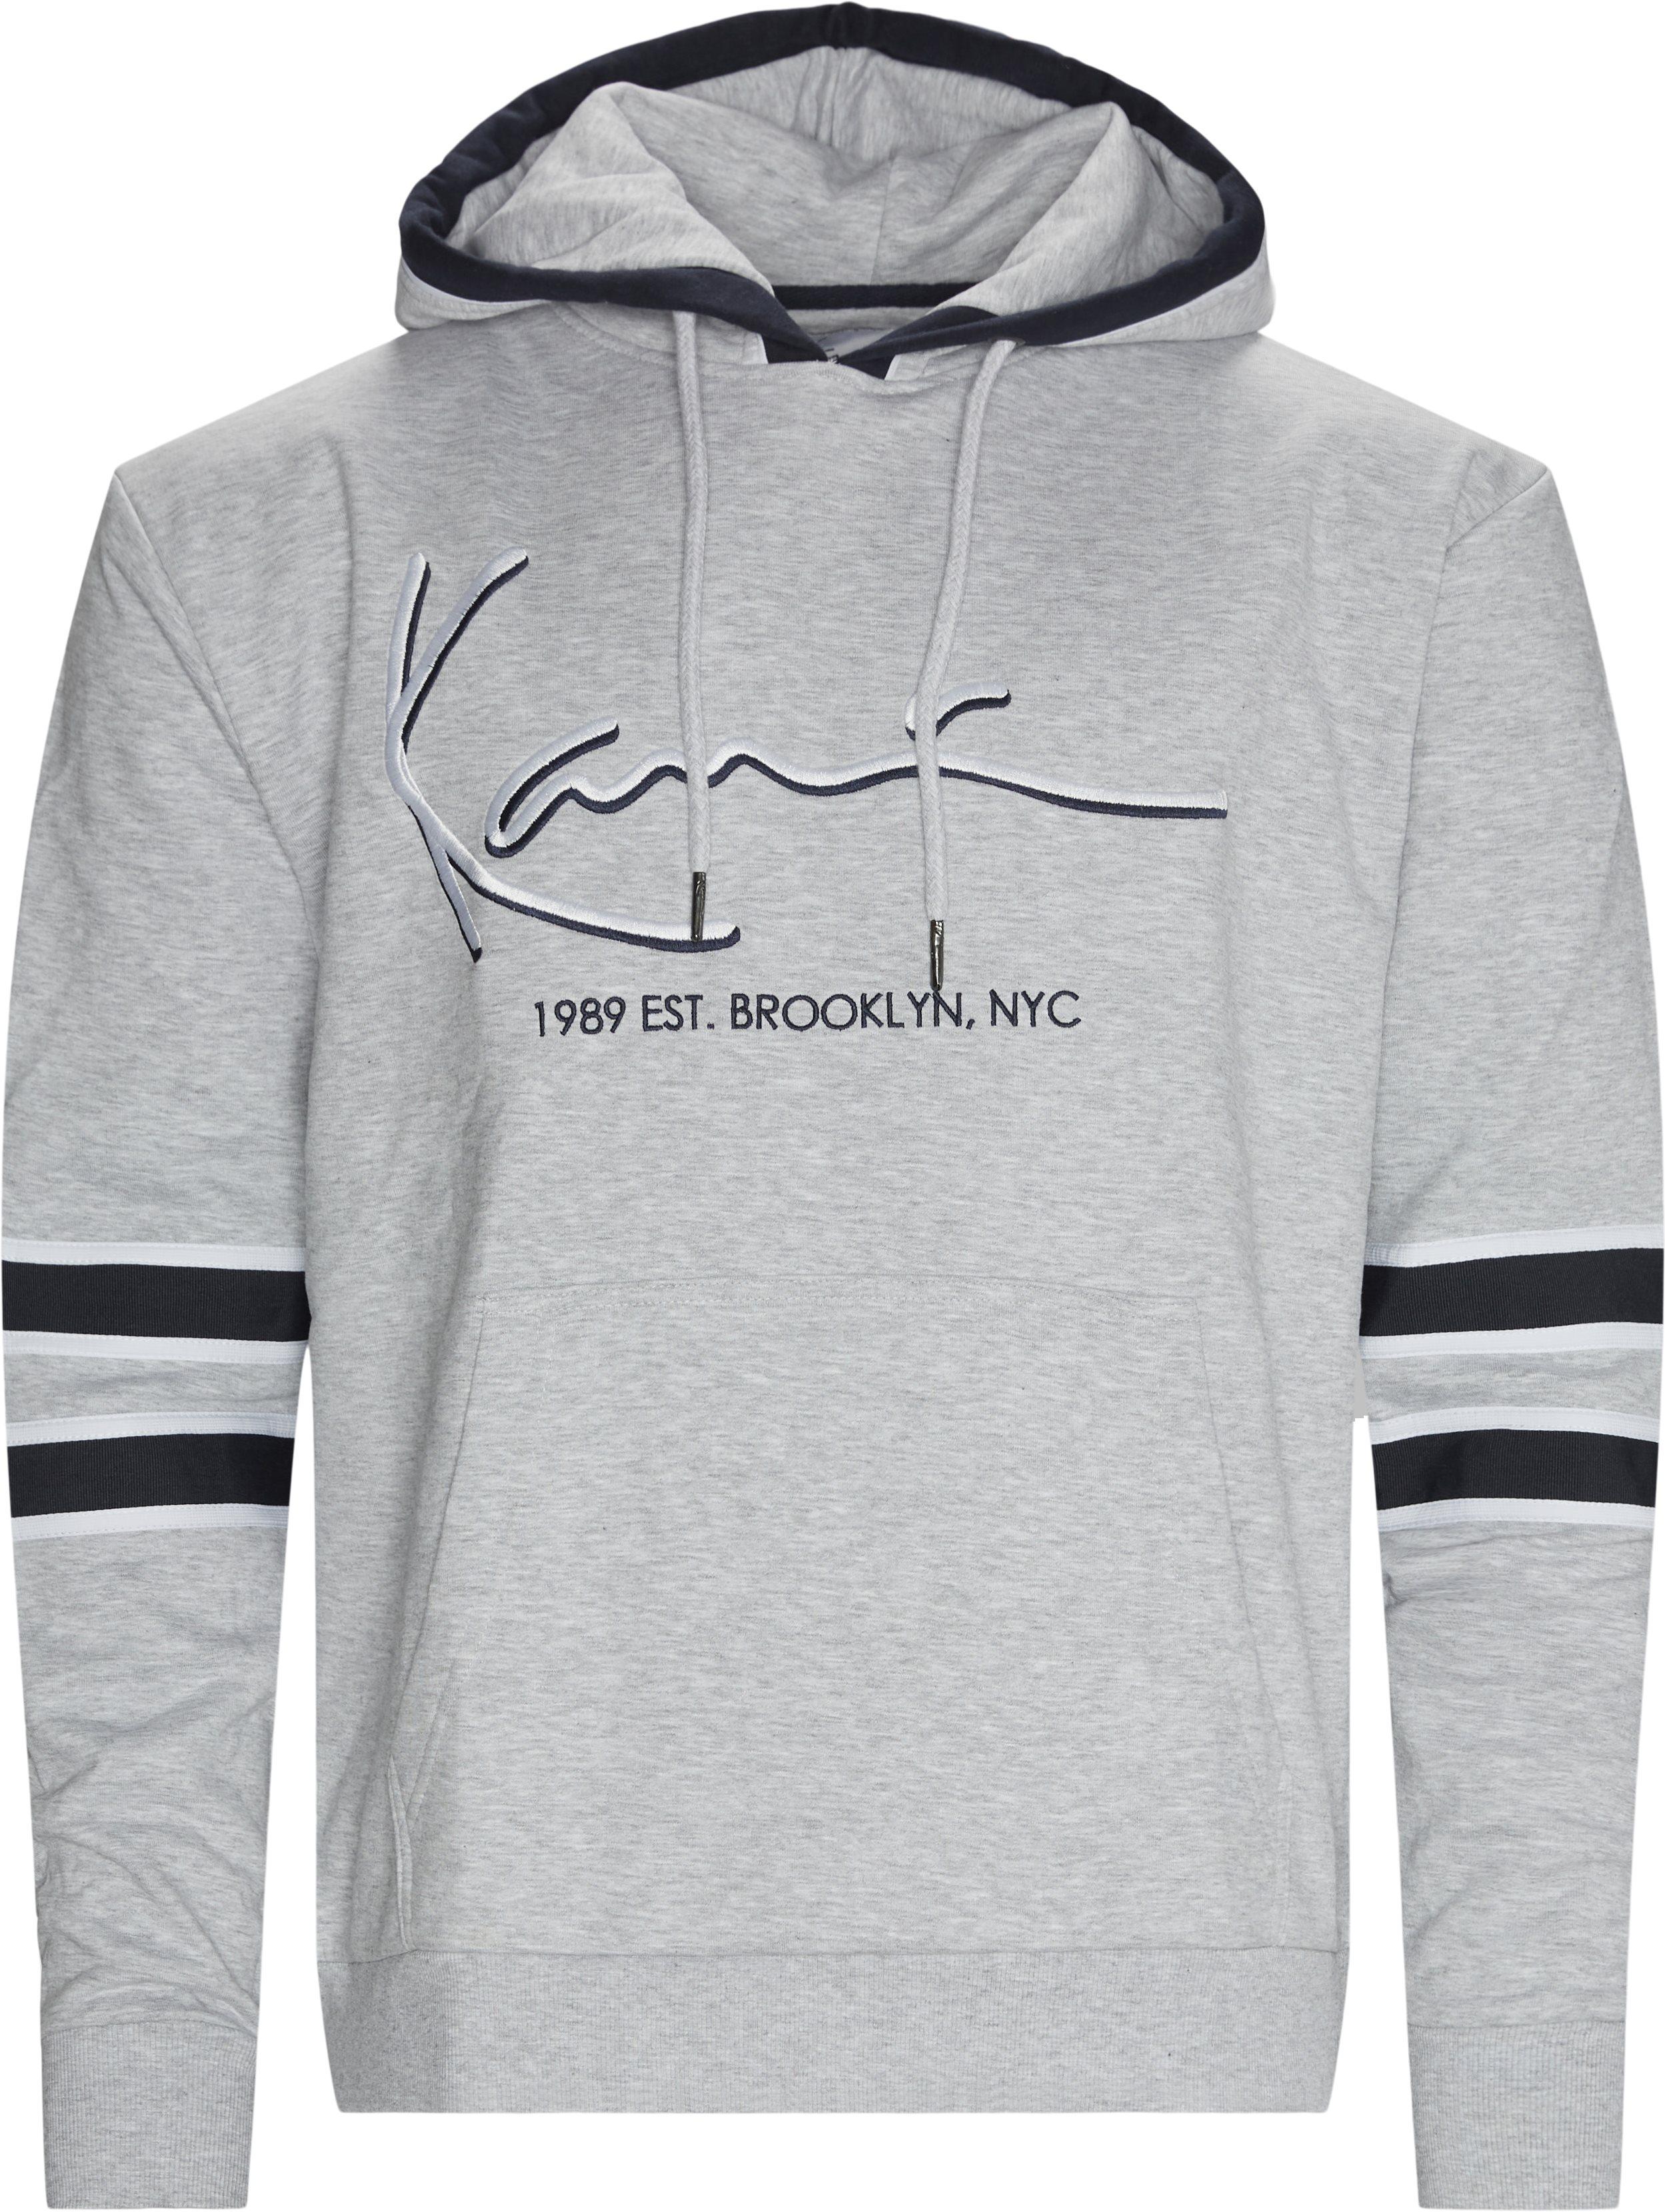 Signature Block Hoodie - Sweatshirts - Regular fit - Grå